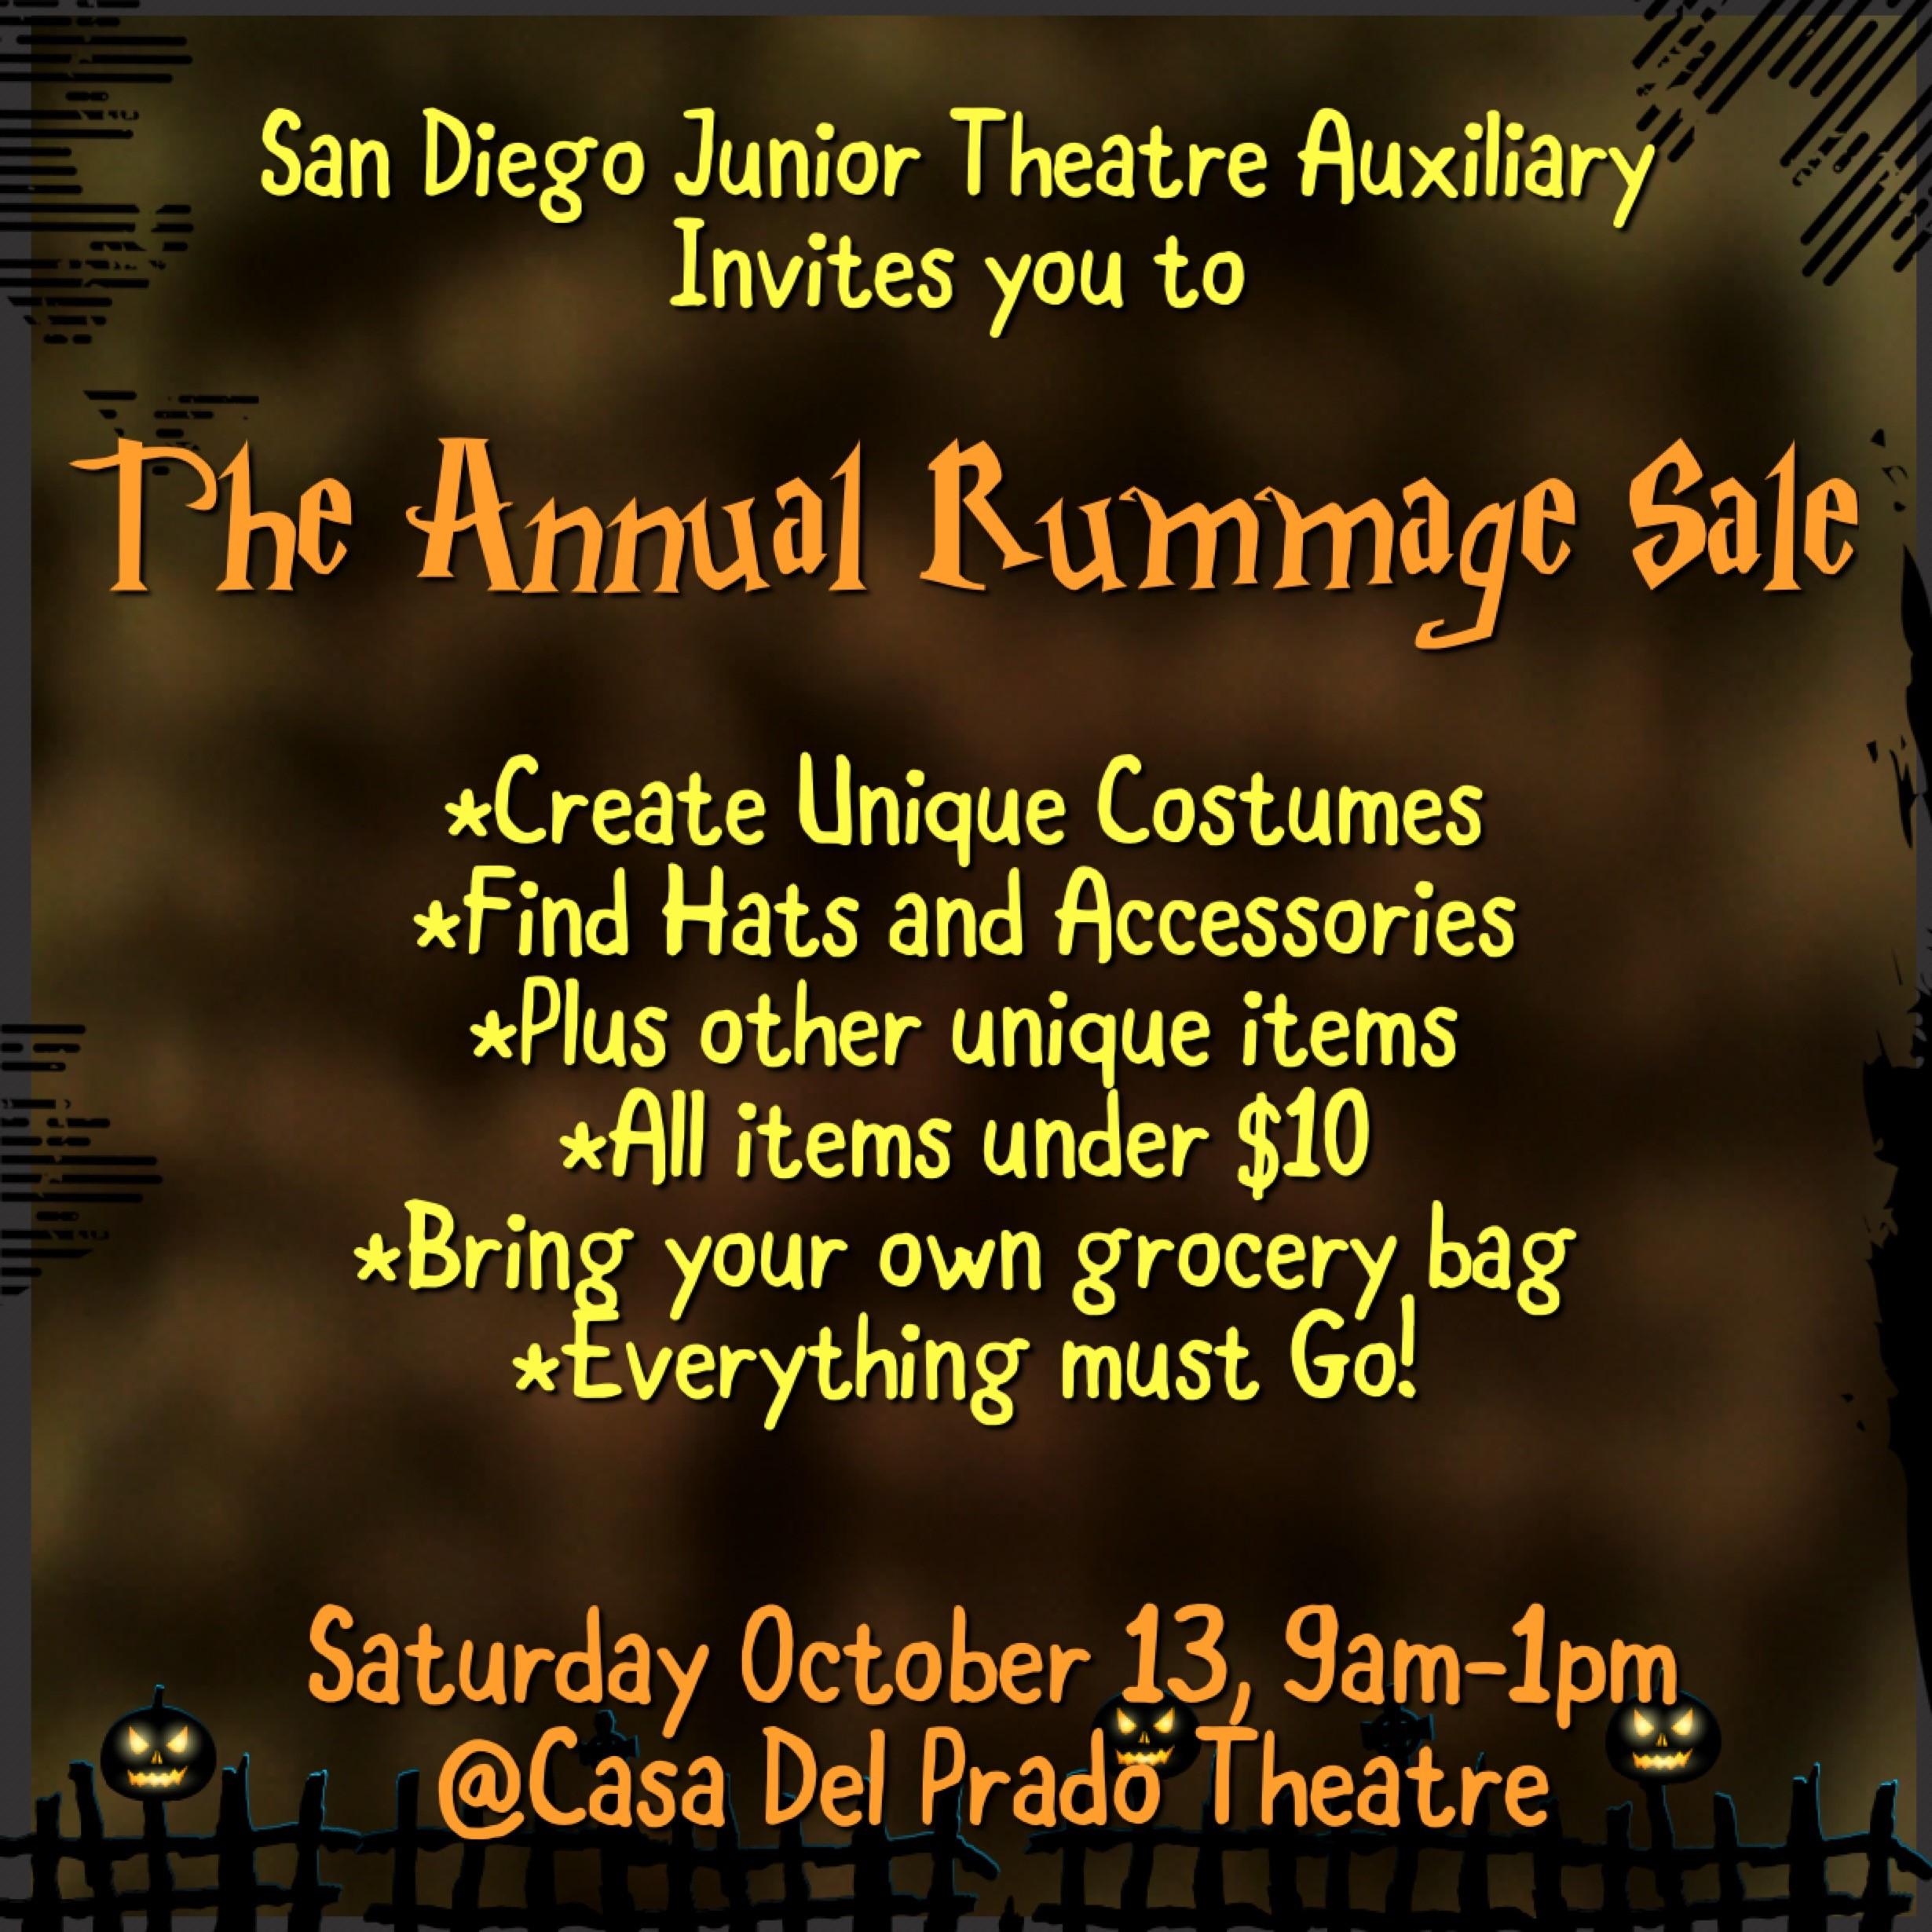 Junior Theatre Auxiliary Annual Rummage Sale, October 13th!